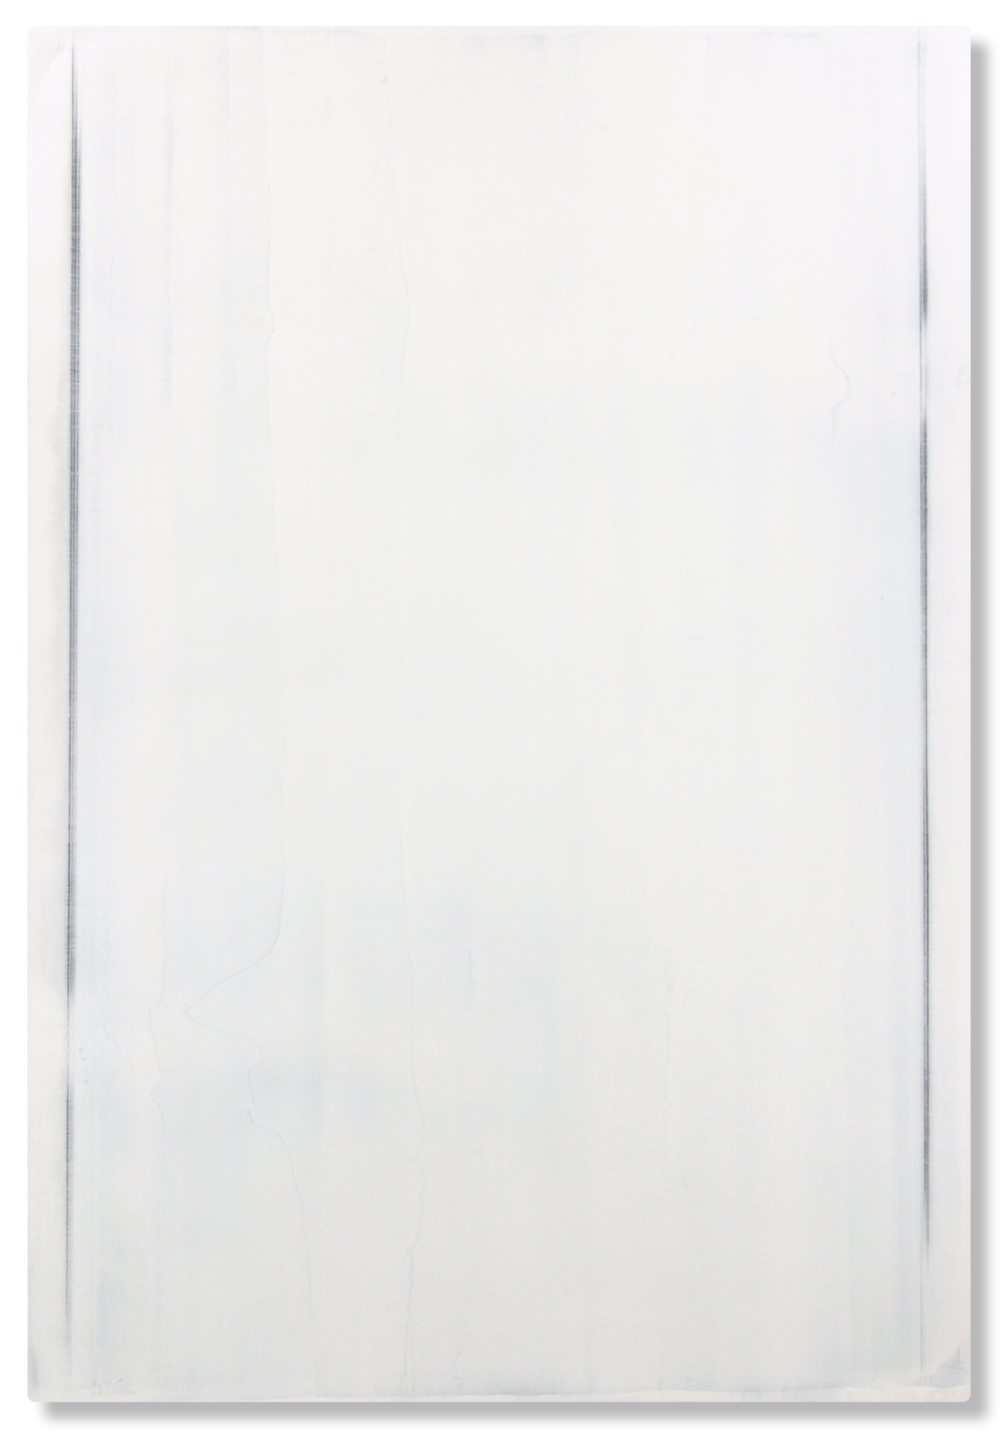 DOORA_AF 2006-24.png